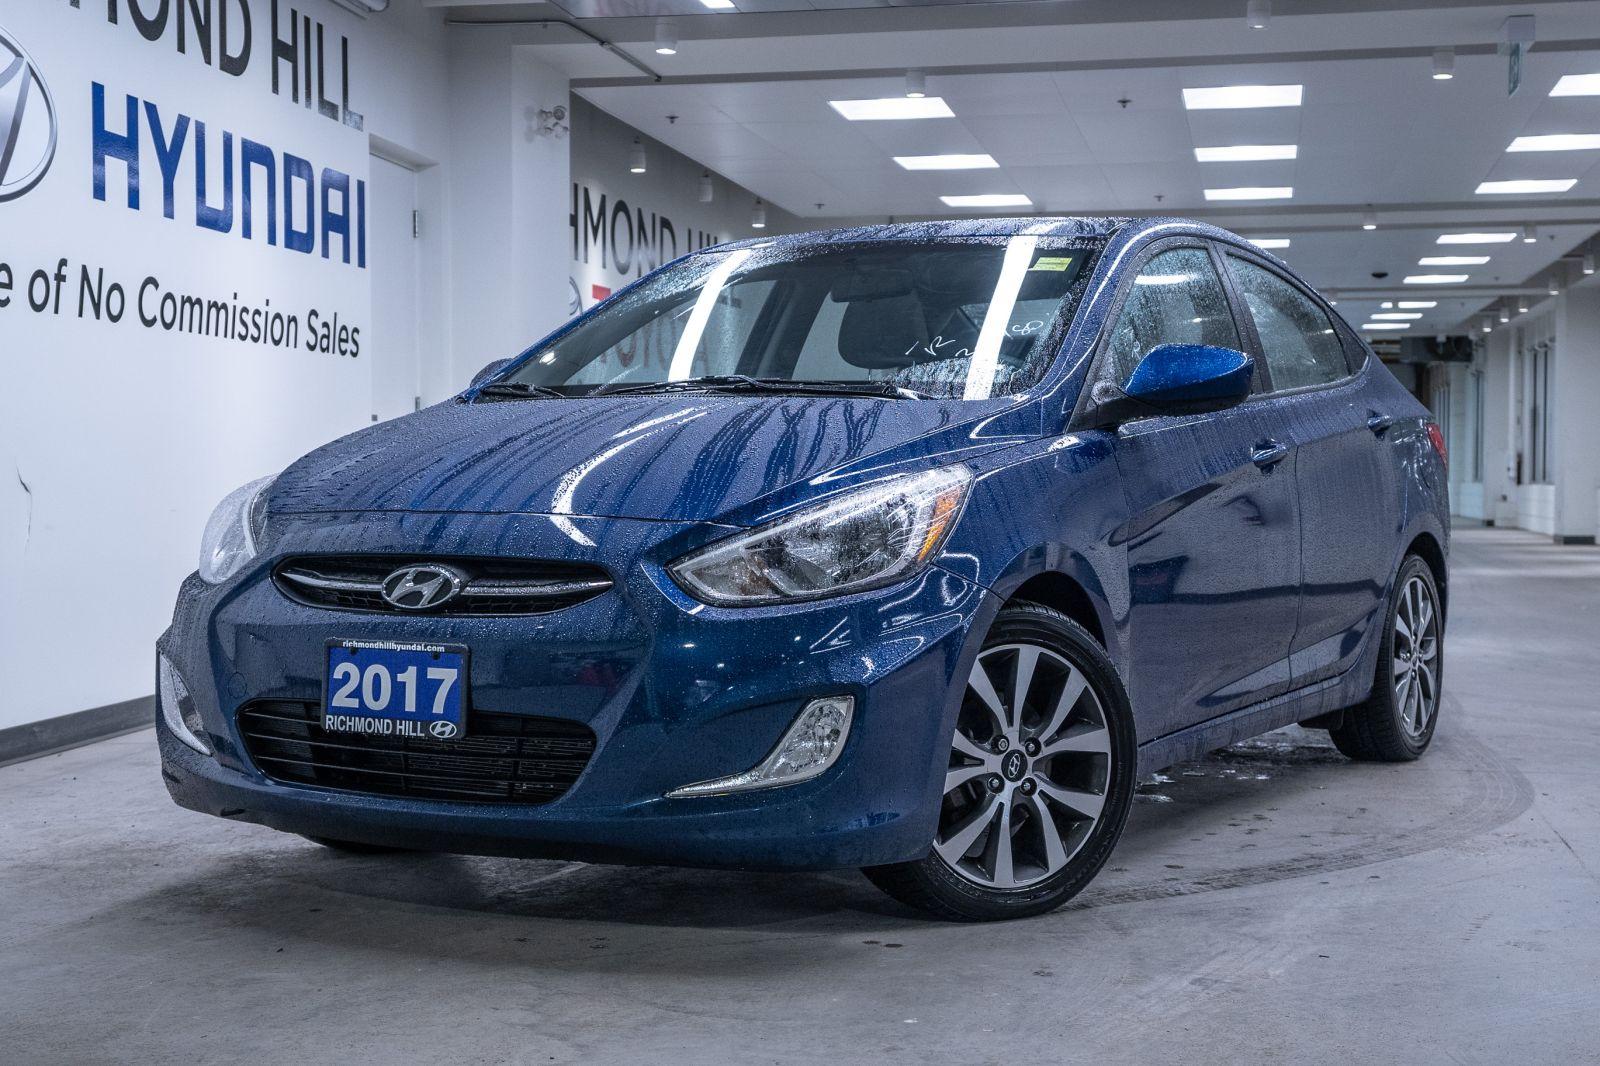 2017 Hyundai Accent Image